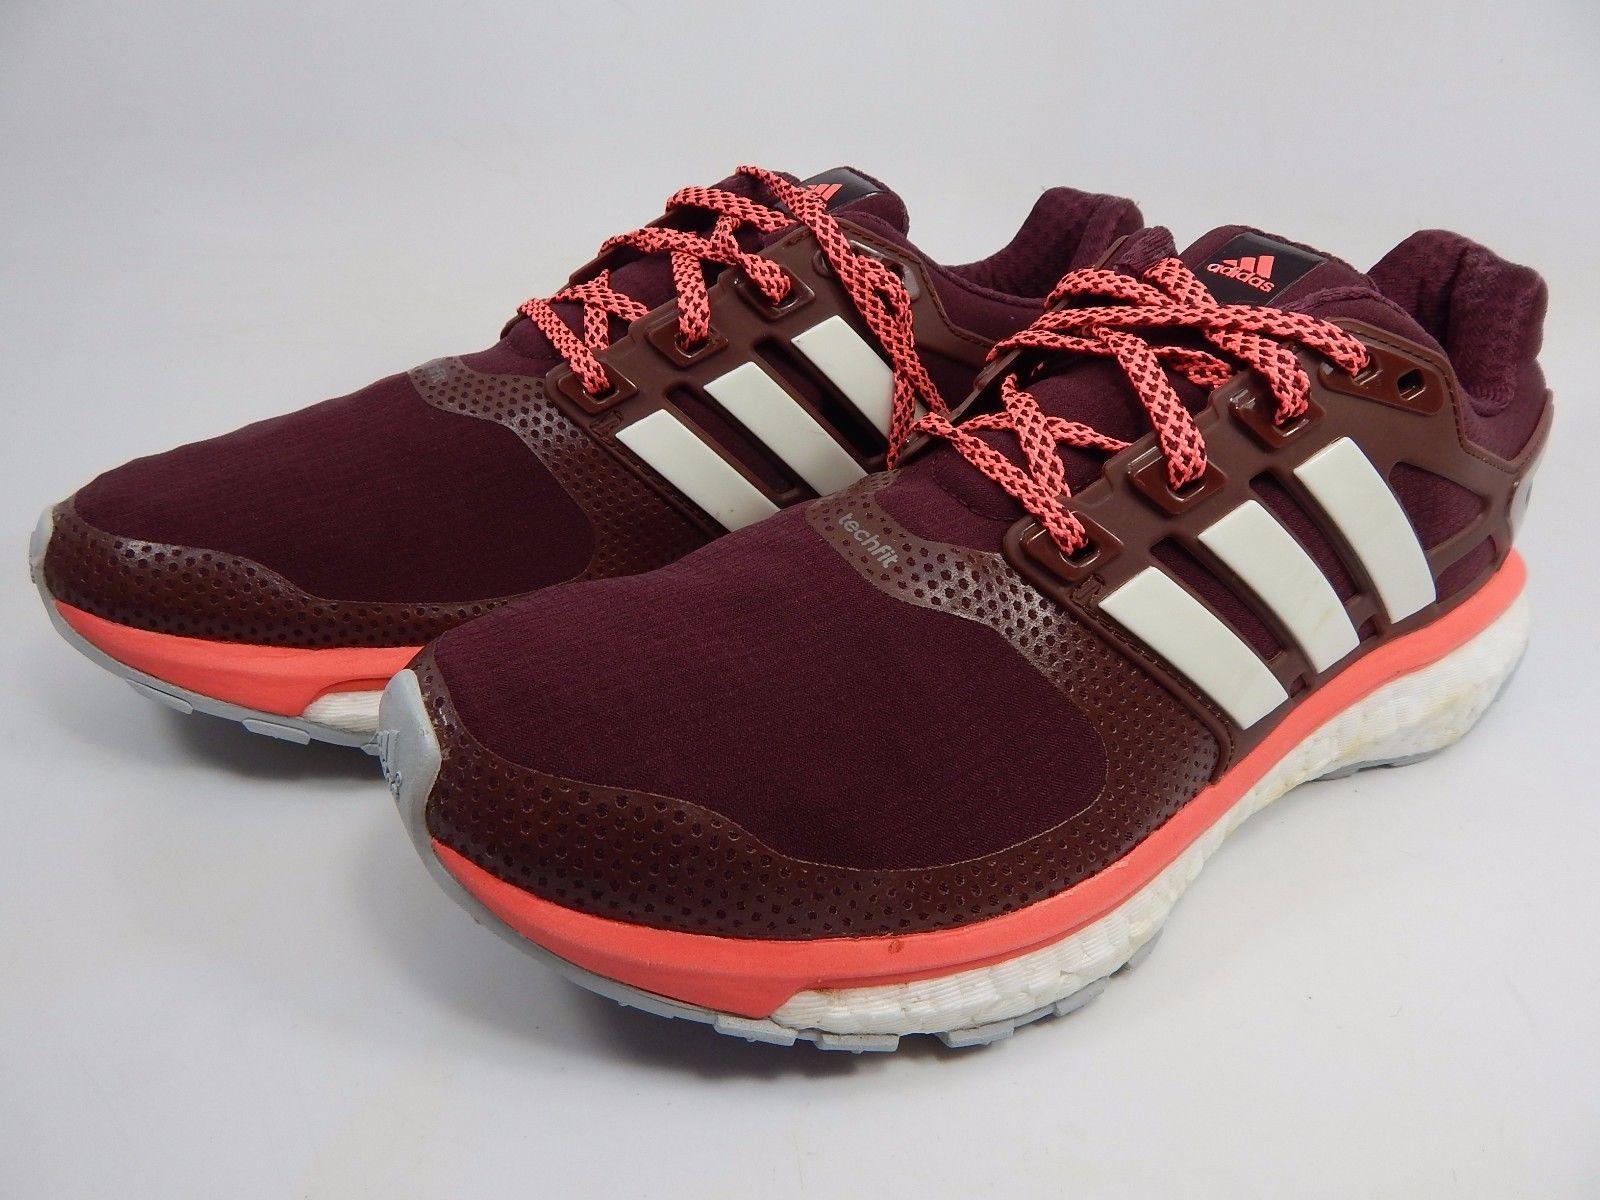 Adidas Energy Boost 2.0 ATR Women's Running Shoes Sz US 7 M (B) EU 38 2/3 B23151